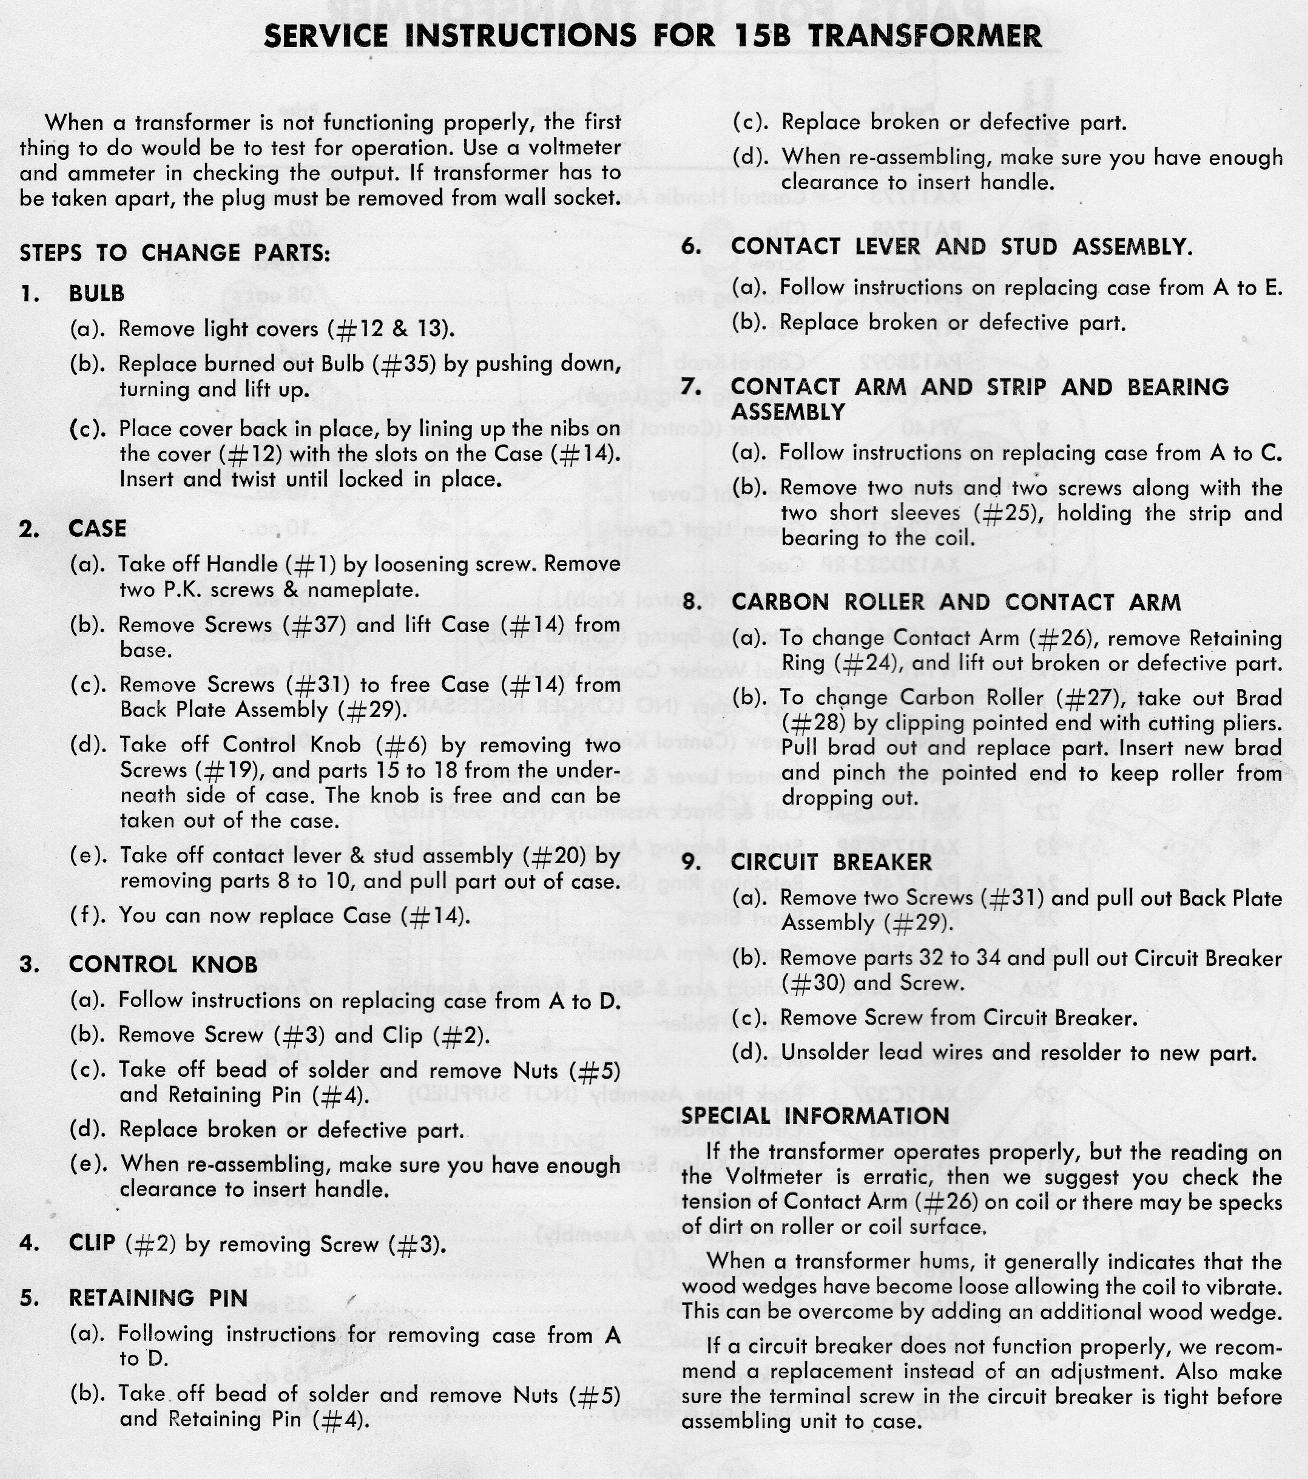 Service Instructions for No. 15B Transformer